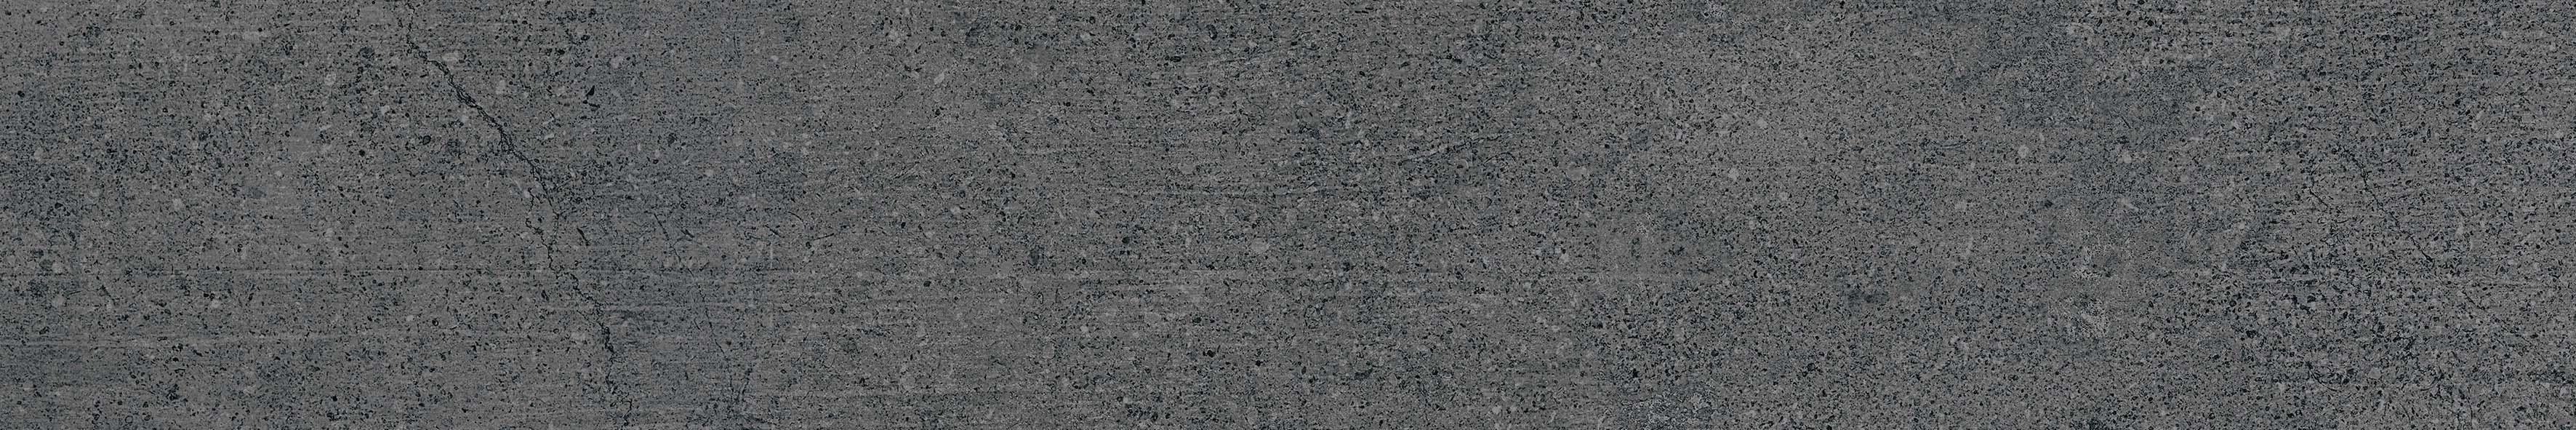 10x80 Newcon Plinth Dark Grey Matt